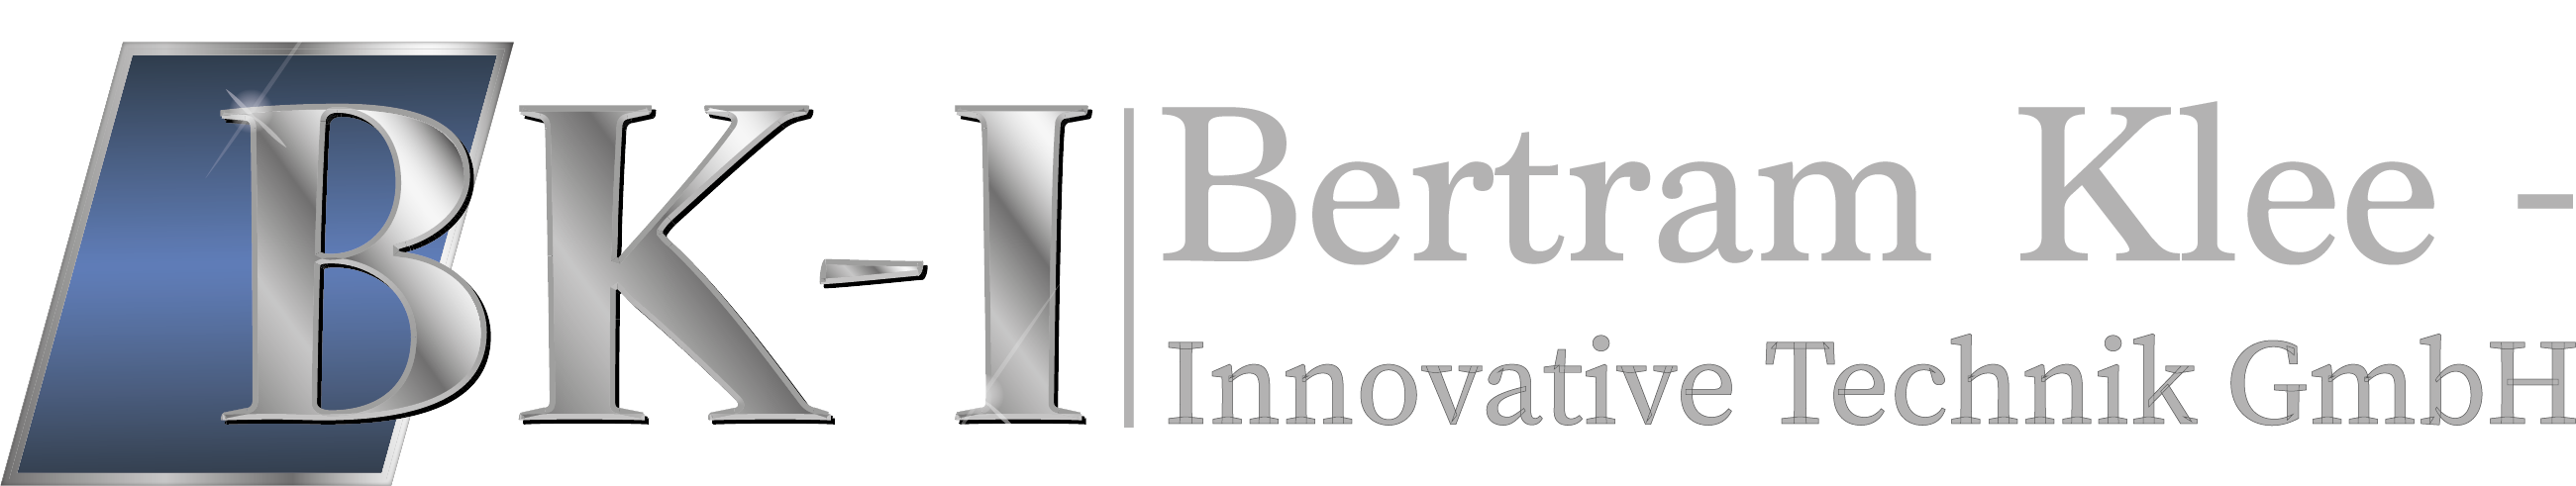 Logo Betram Klee Innovative Technik GmbH - World of Metal Processing